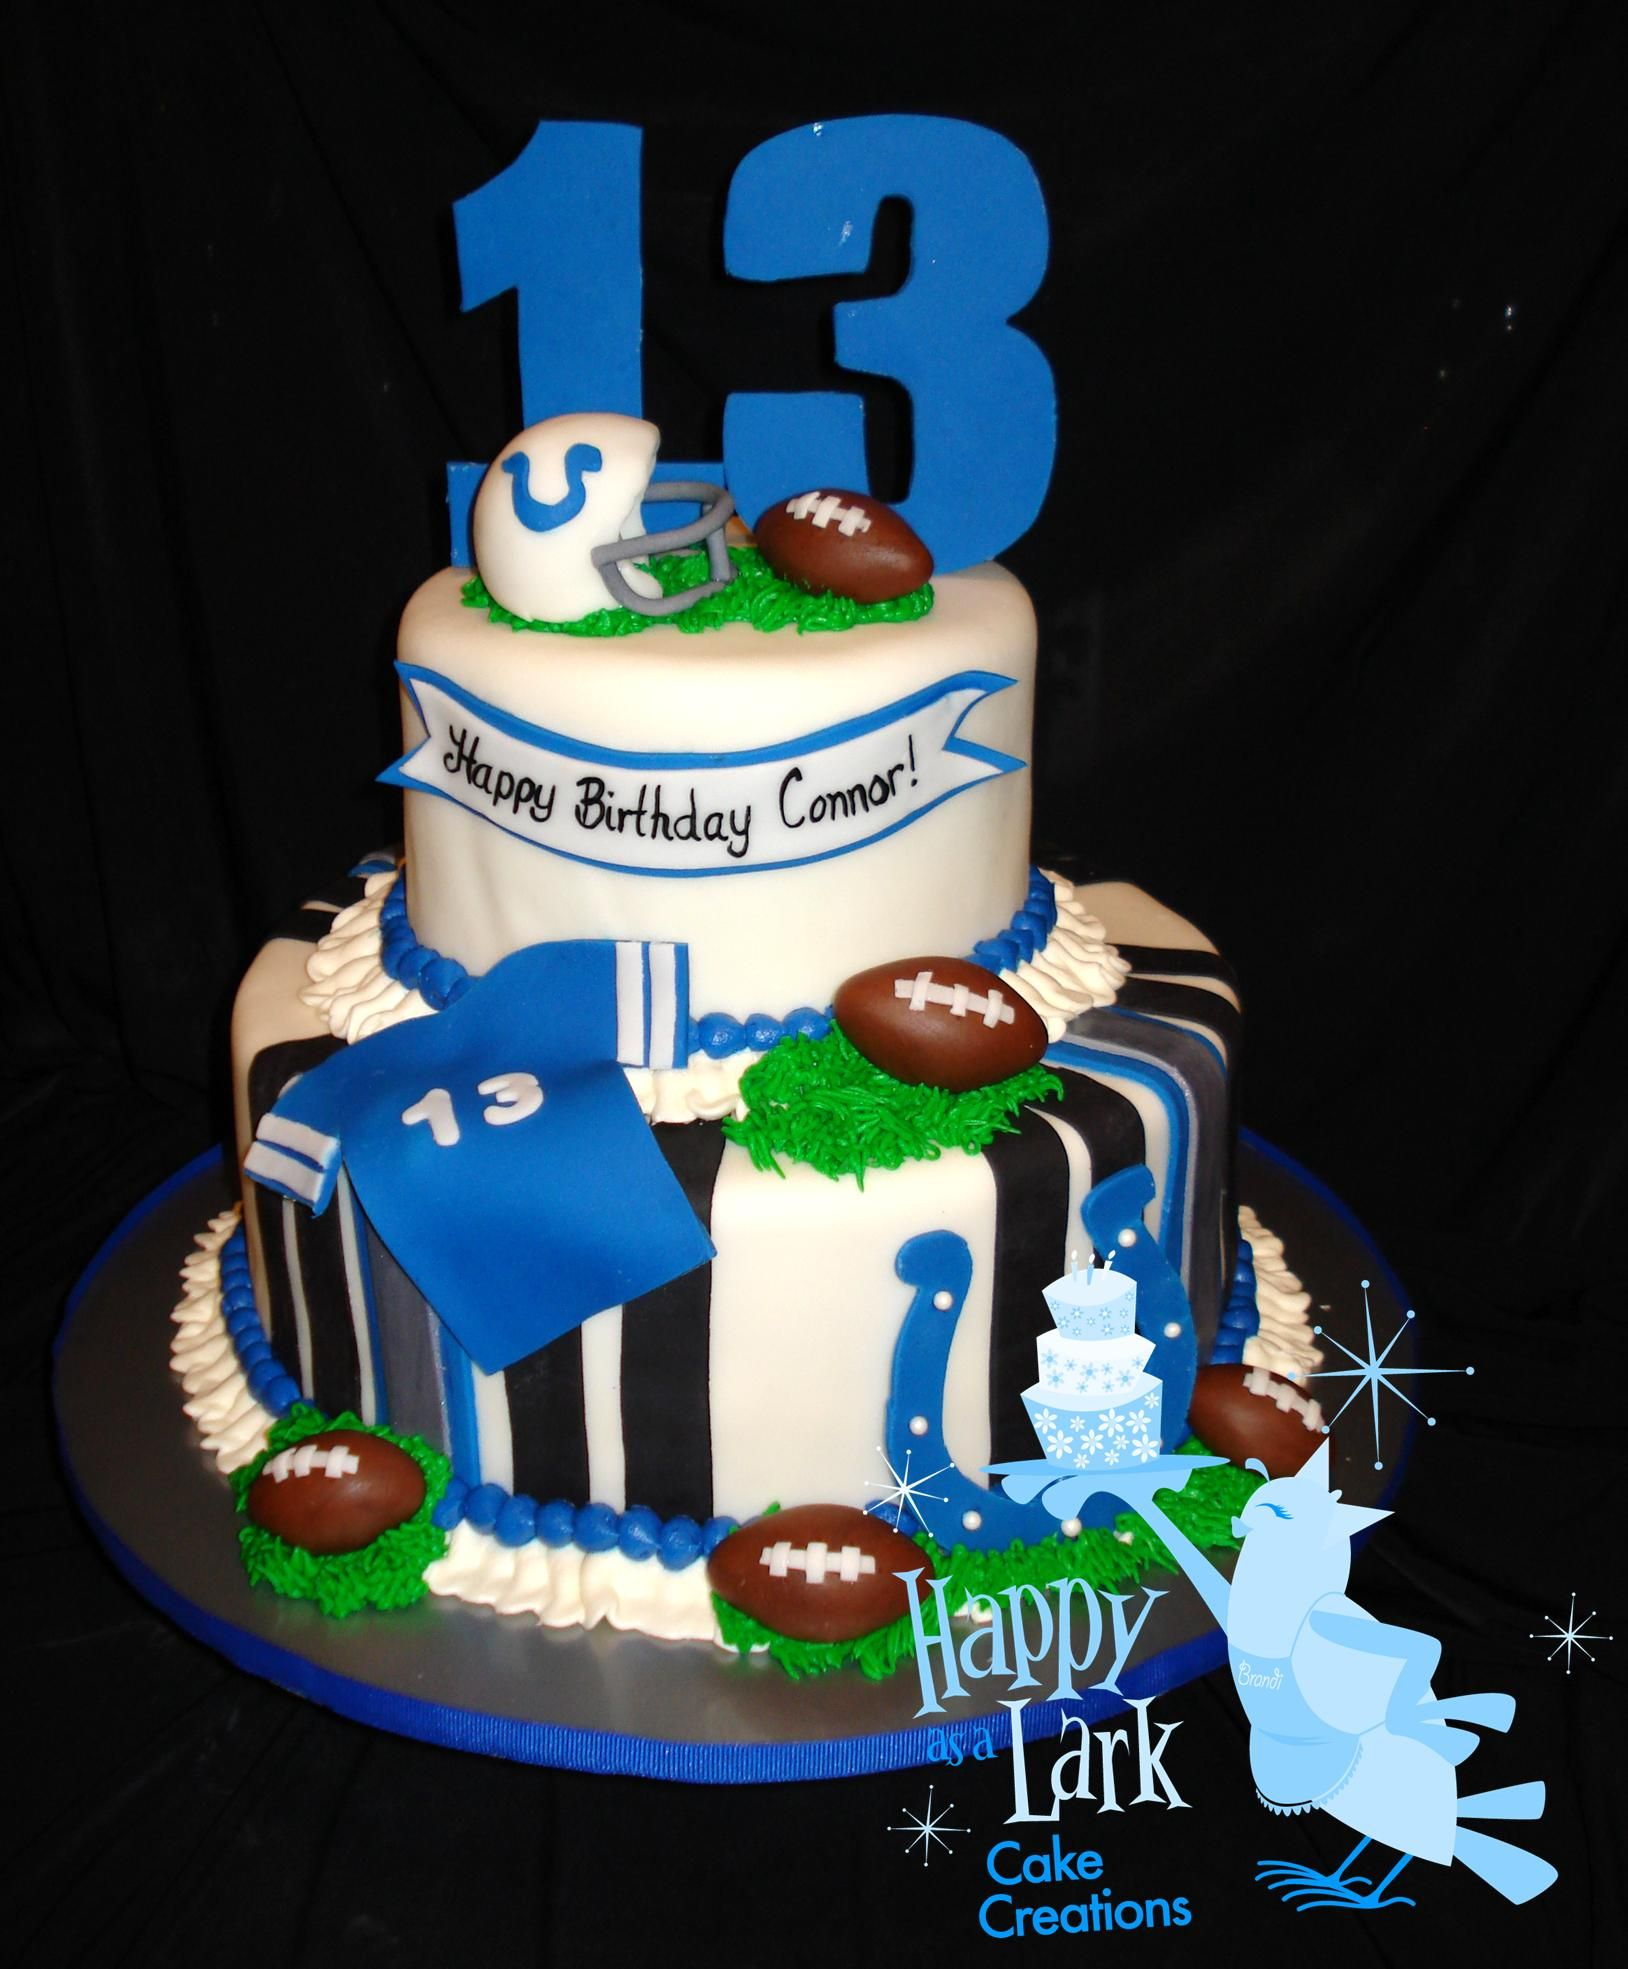 13th birthday cake cake 40th birthday cakes birthday cake